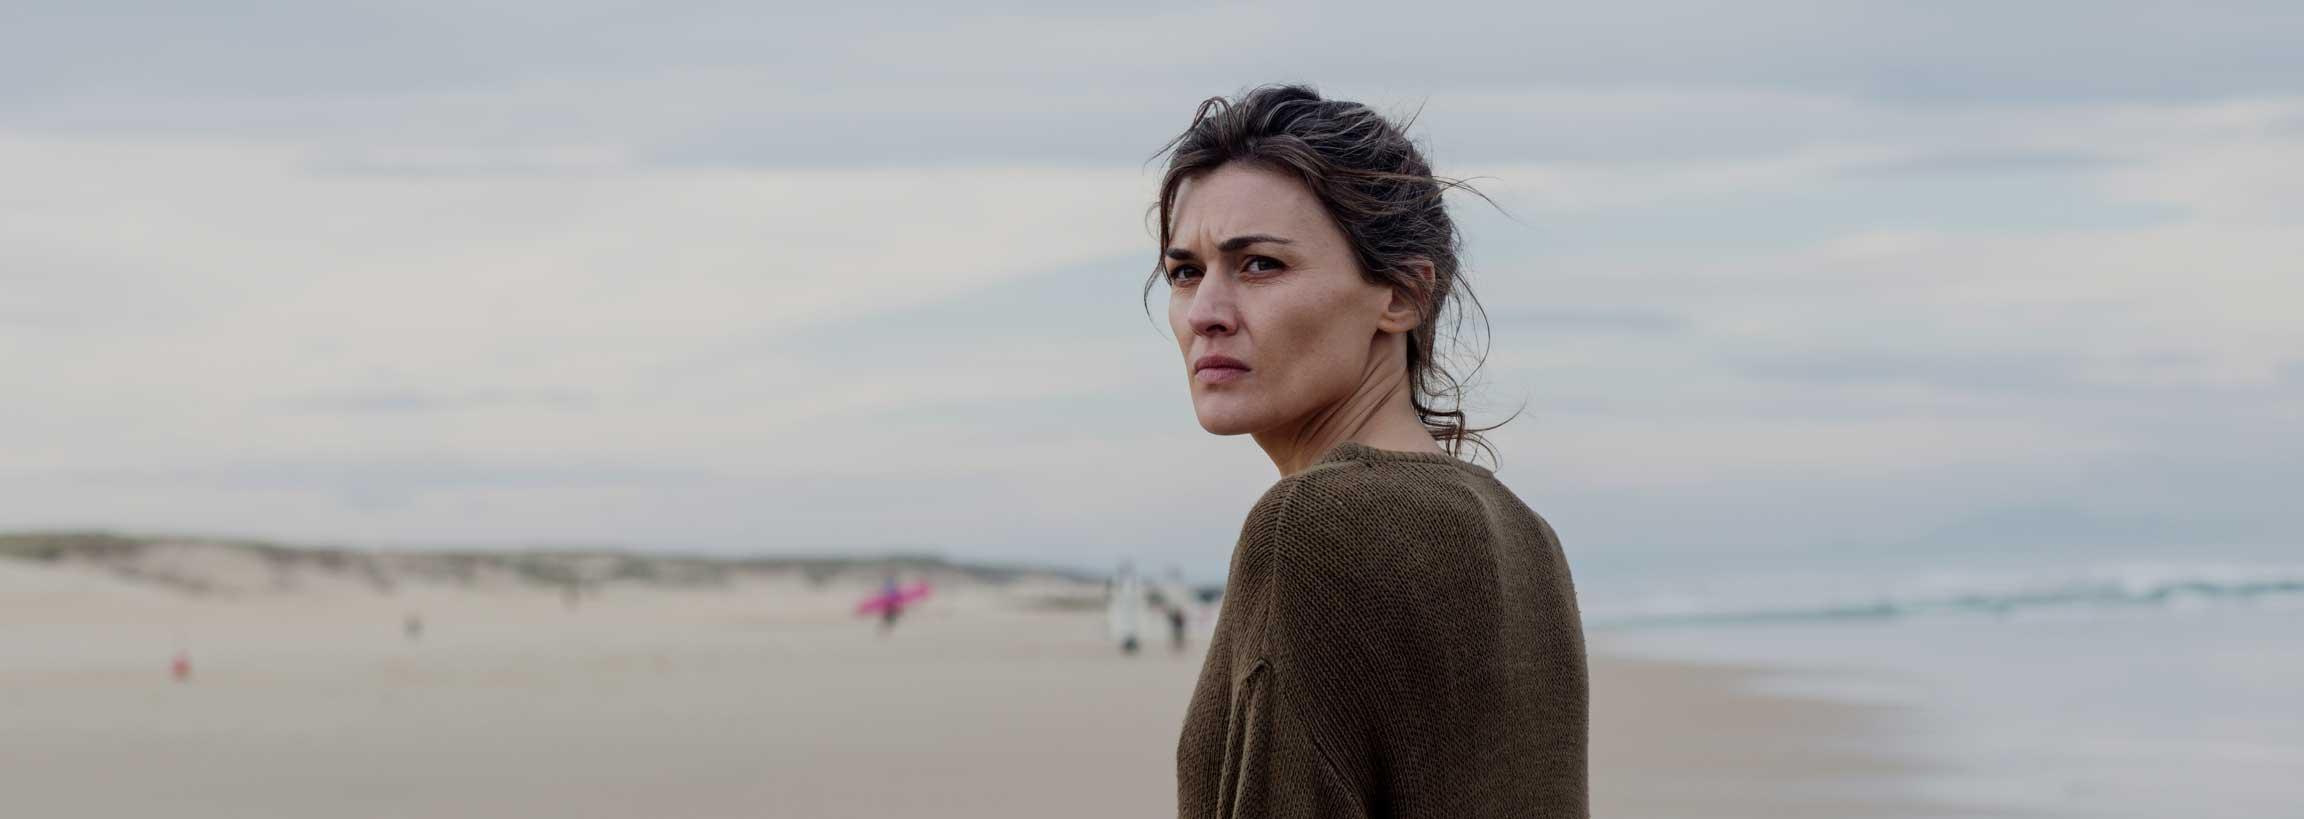 Madre (long-métrage) de Rodrigo Sorogoyen (2019)